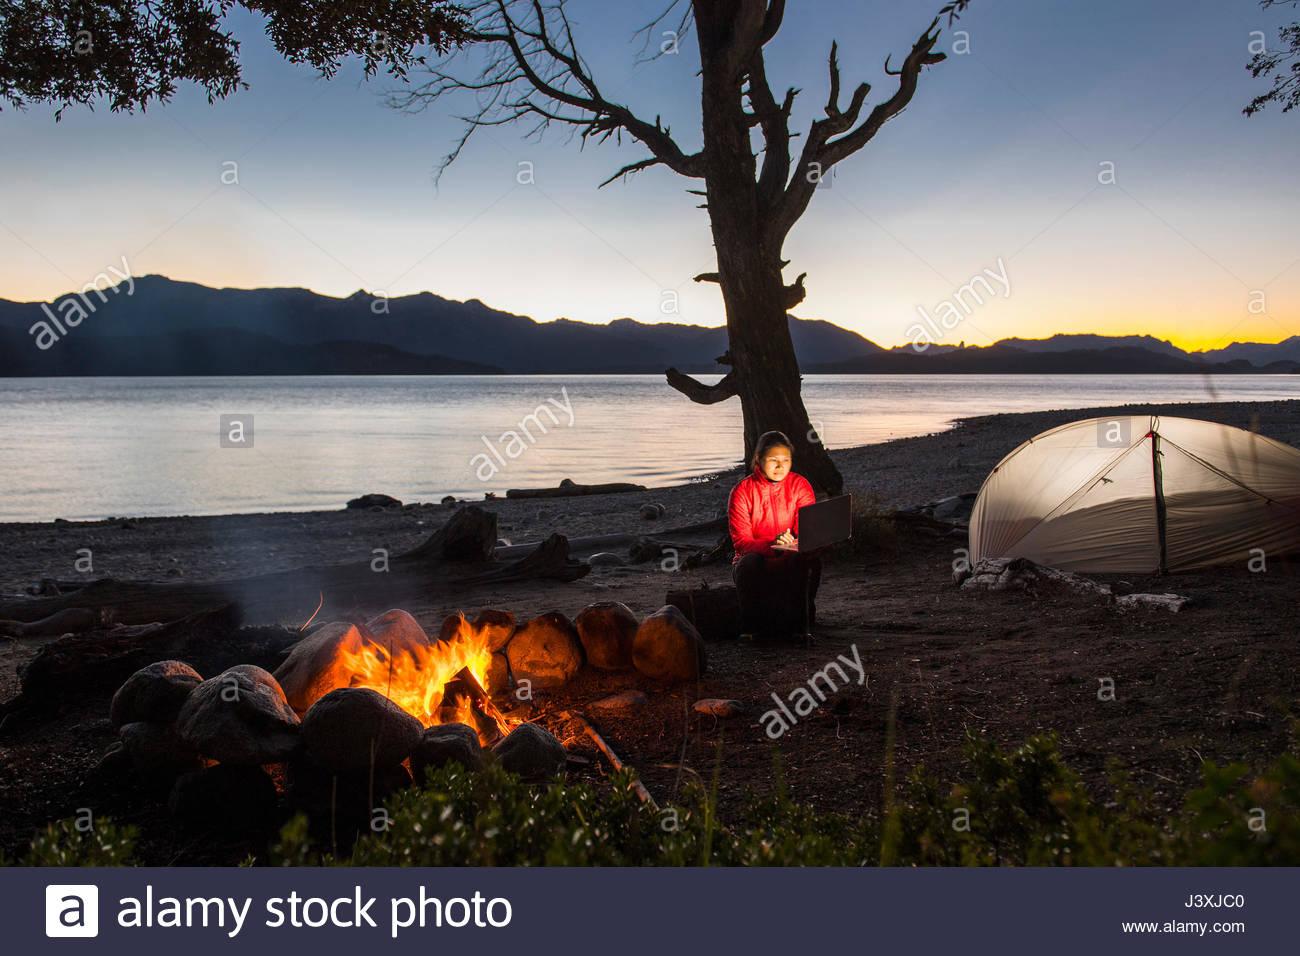 Woman looking at her laptop by a campfire at Nahuel Huapi Lake in Patagonia Stock Photo